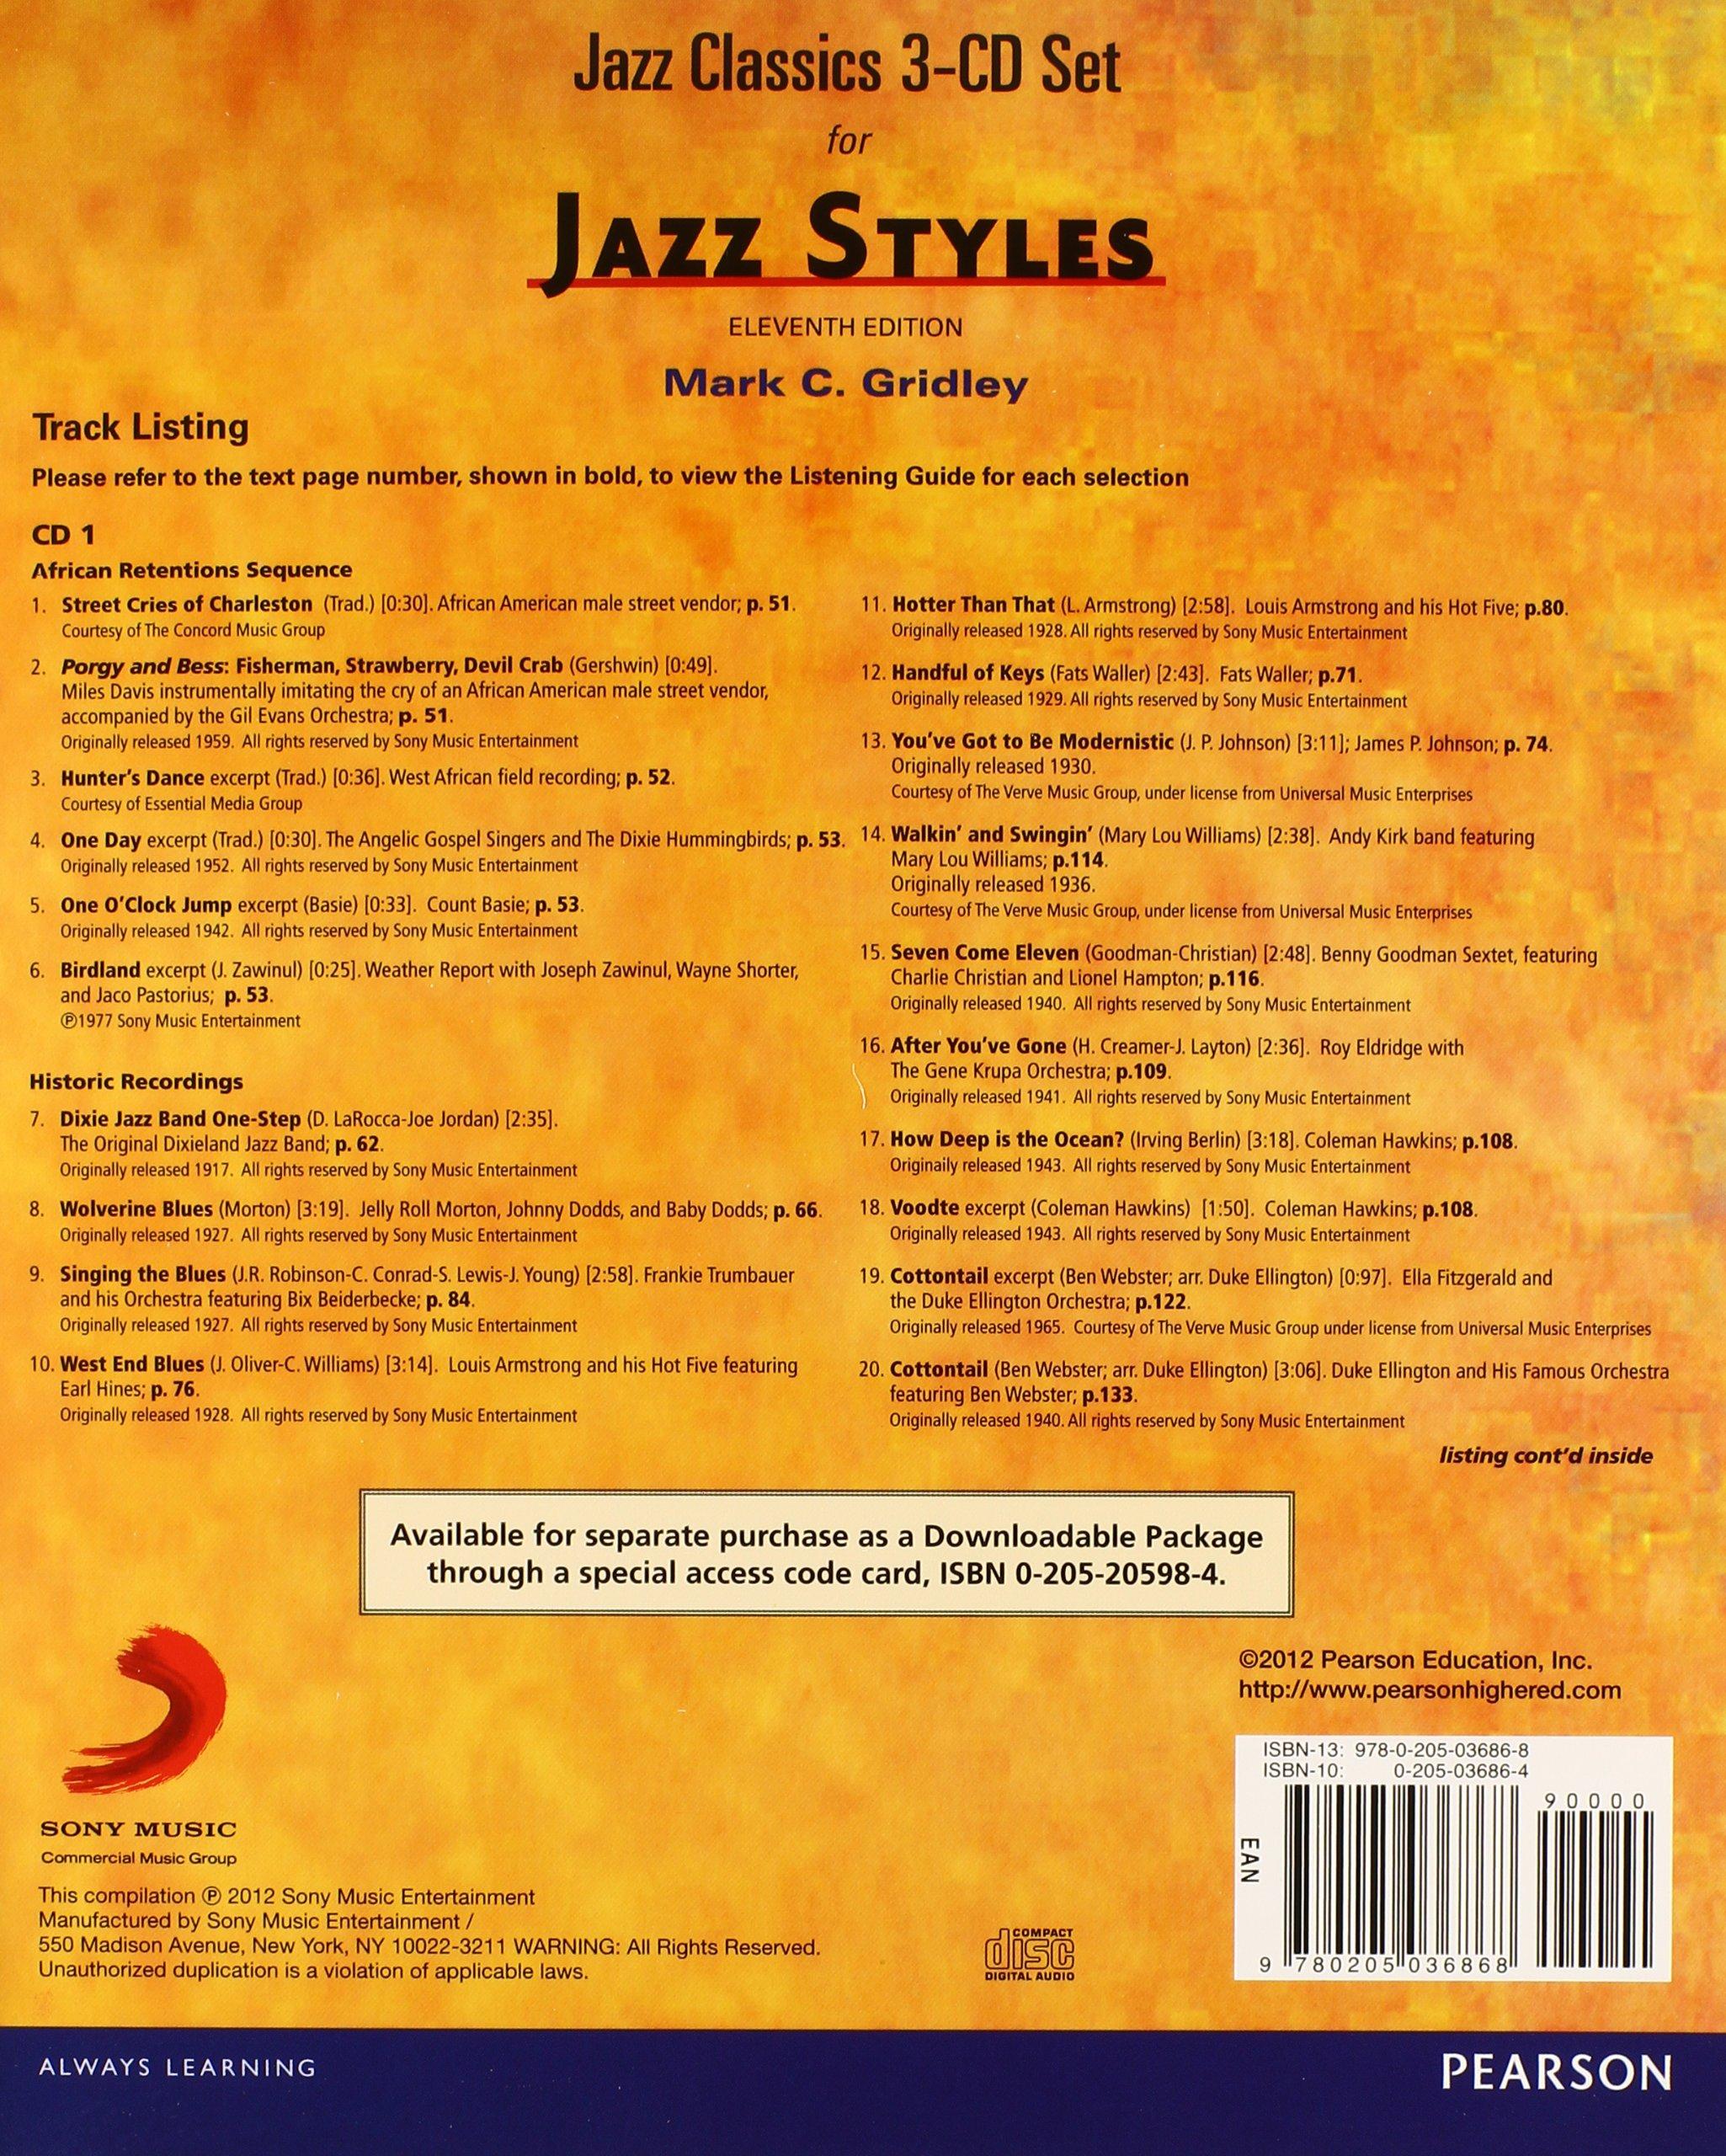 Jazz classics cd set 3 cds for jazz styles mark c gridley jazz classics cd set 3 cds for jazz styles mark c gridley 9780205036868 music amazon canada fandeluxe Gallery